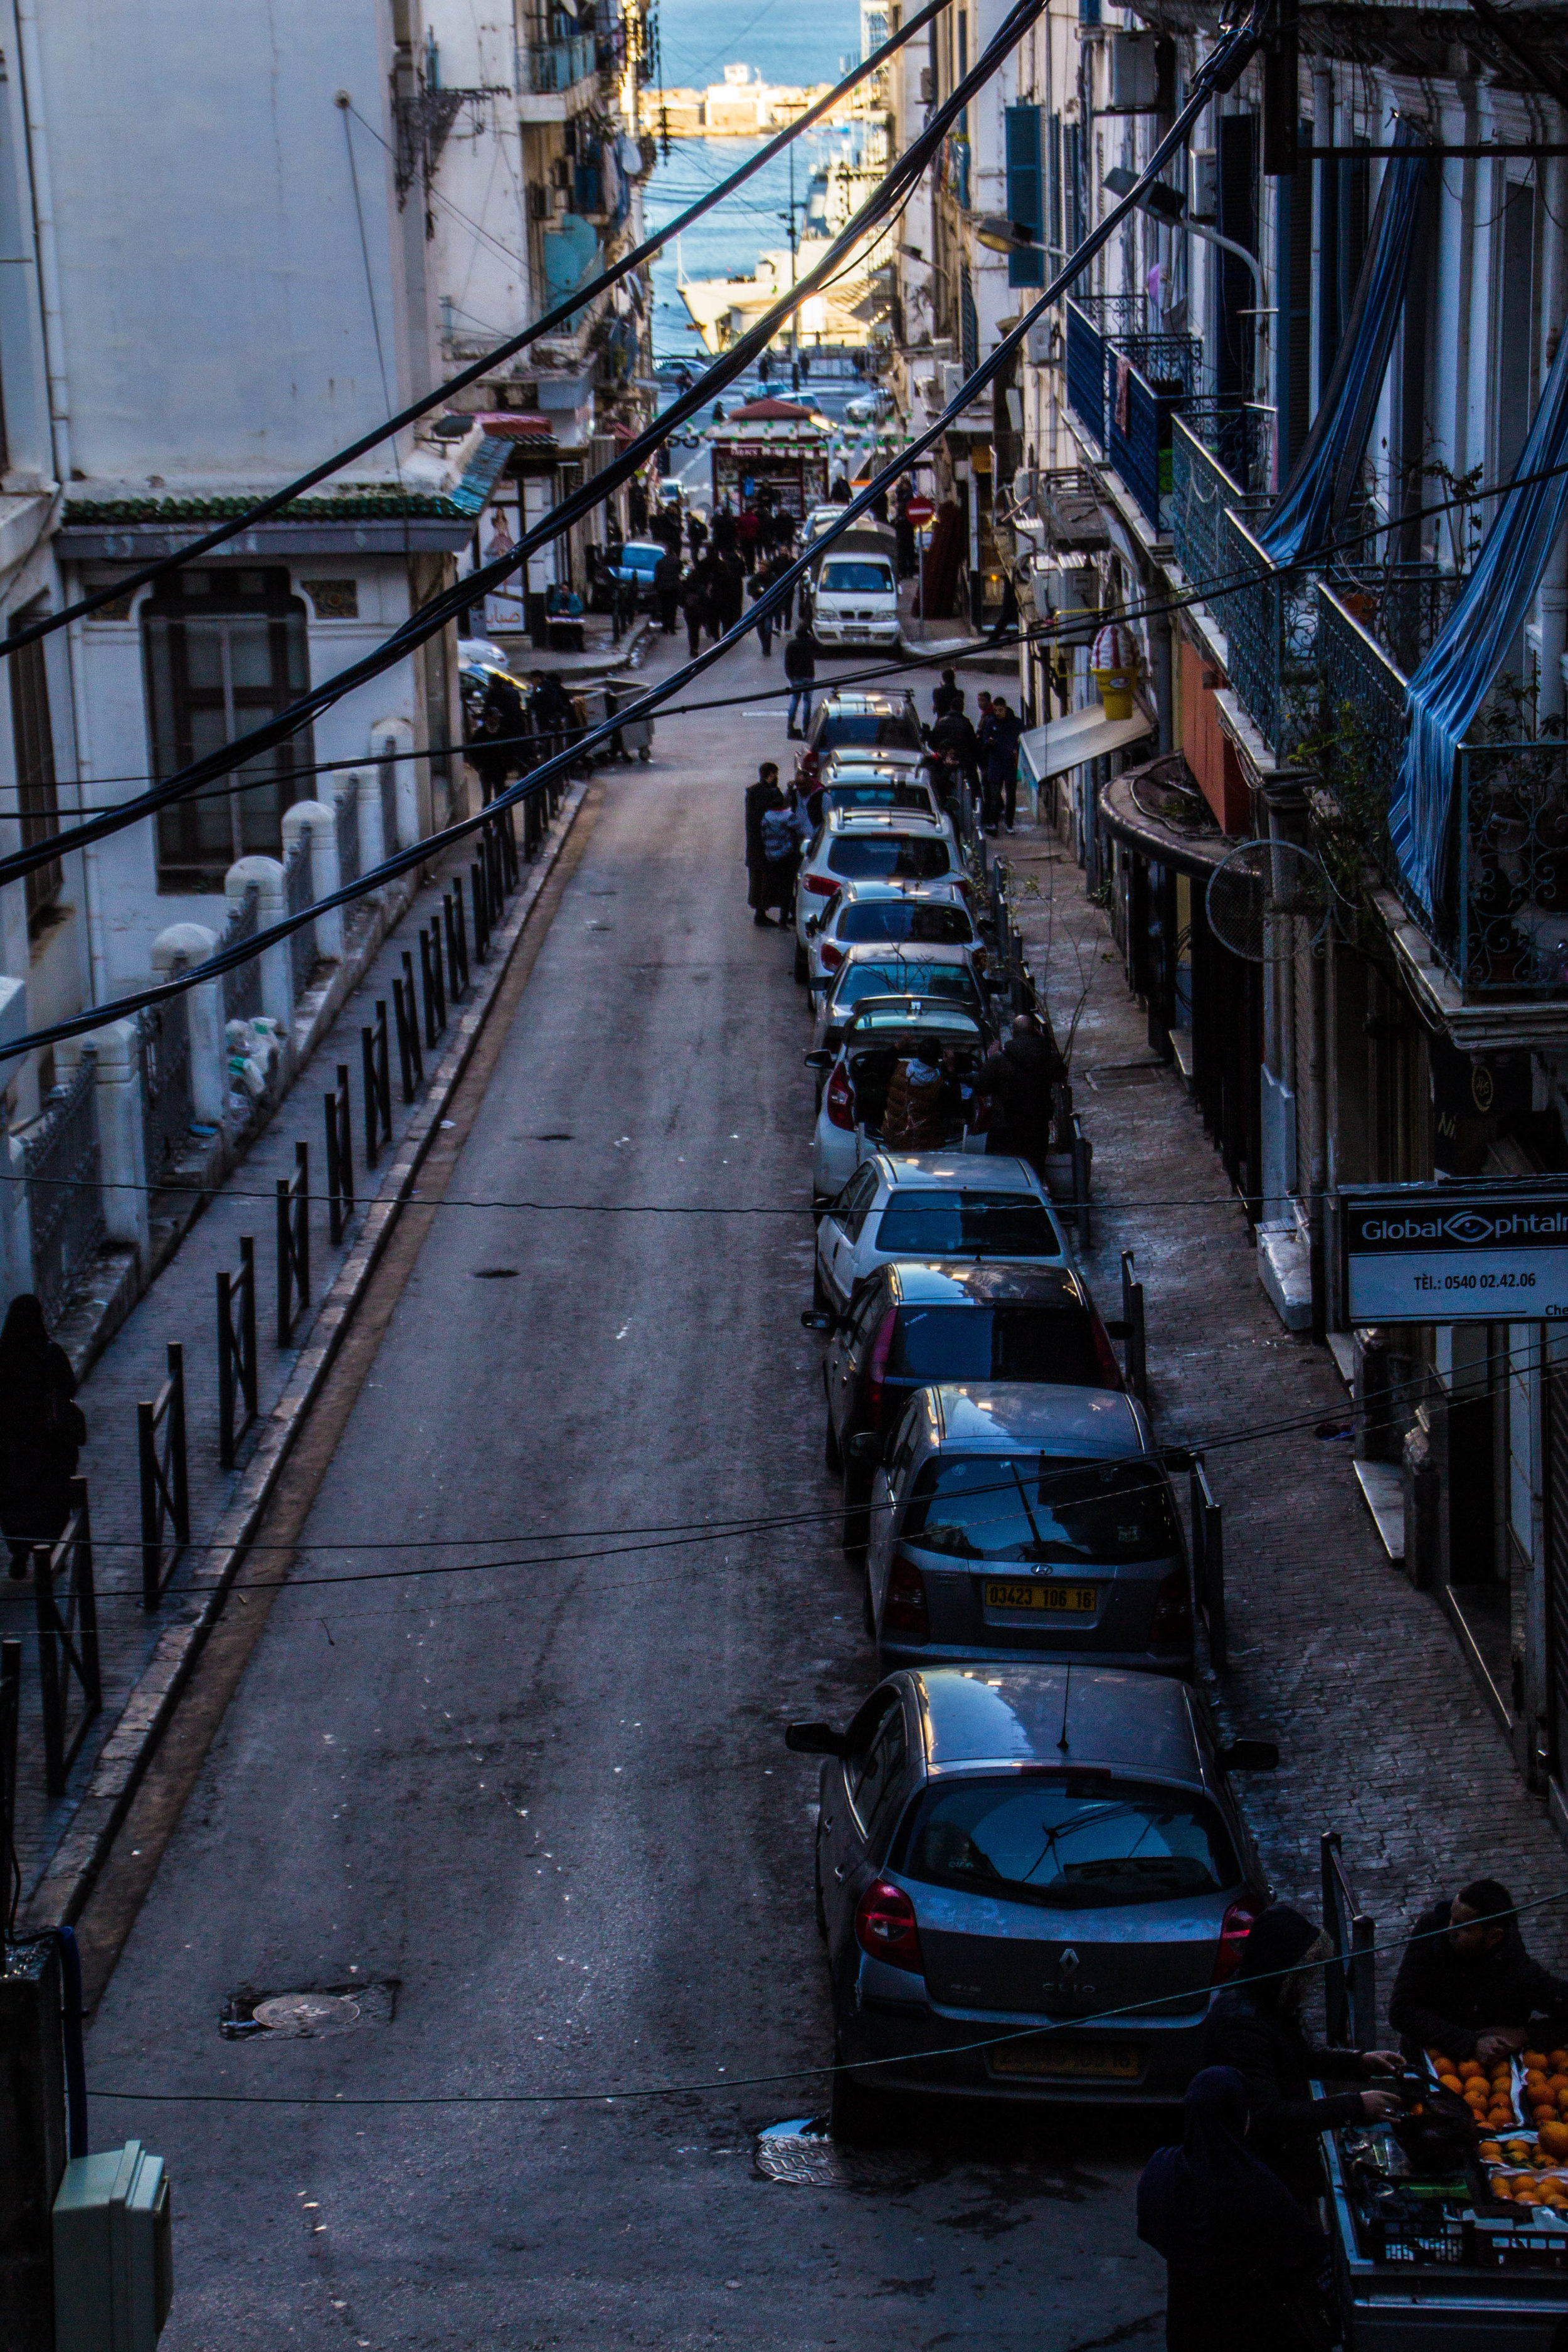 streets-algiers-algeria-20-2.jpg